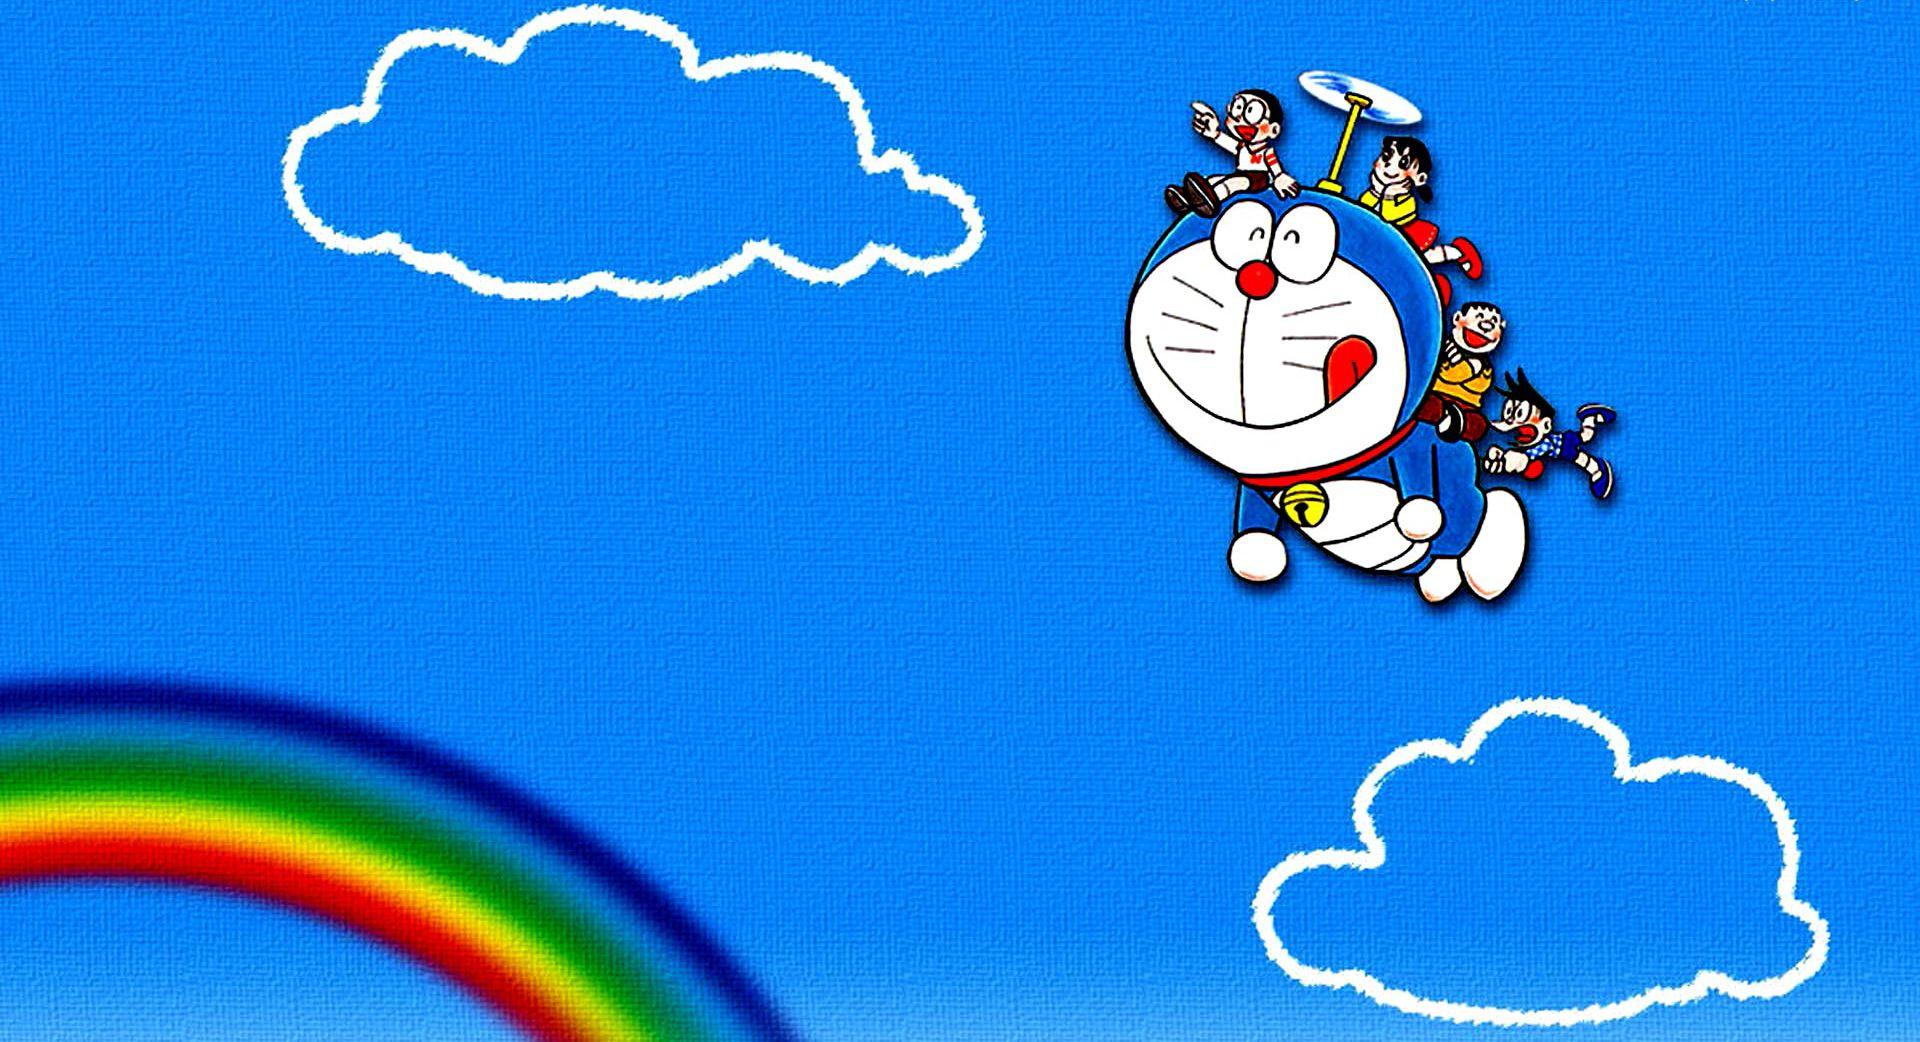 Doraemon hd wallpapers backgrounds wallpaper hd wallpapers doraemon hd wallpapers backgrounds wallpaper voltagebd Images